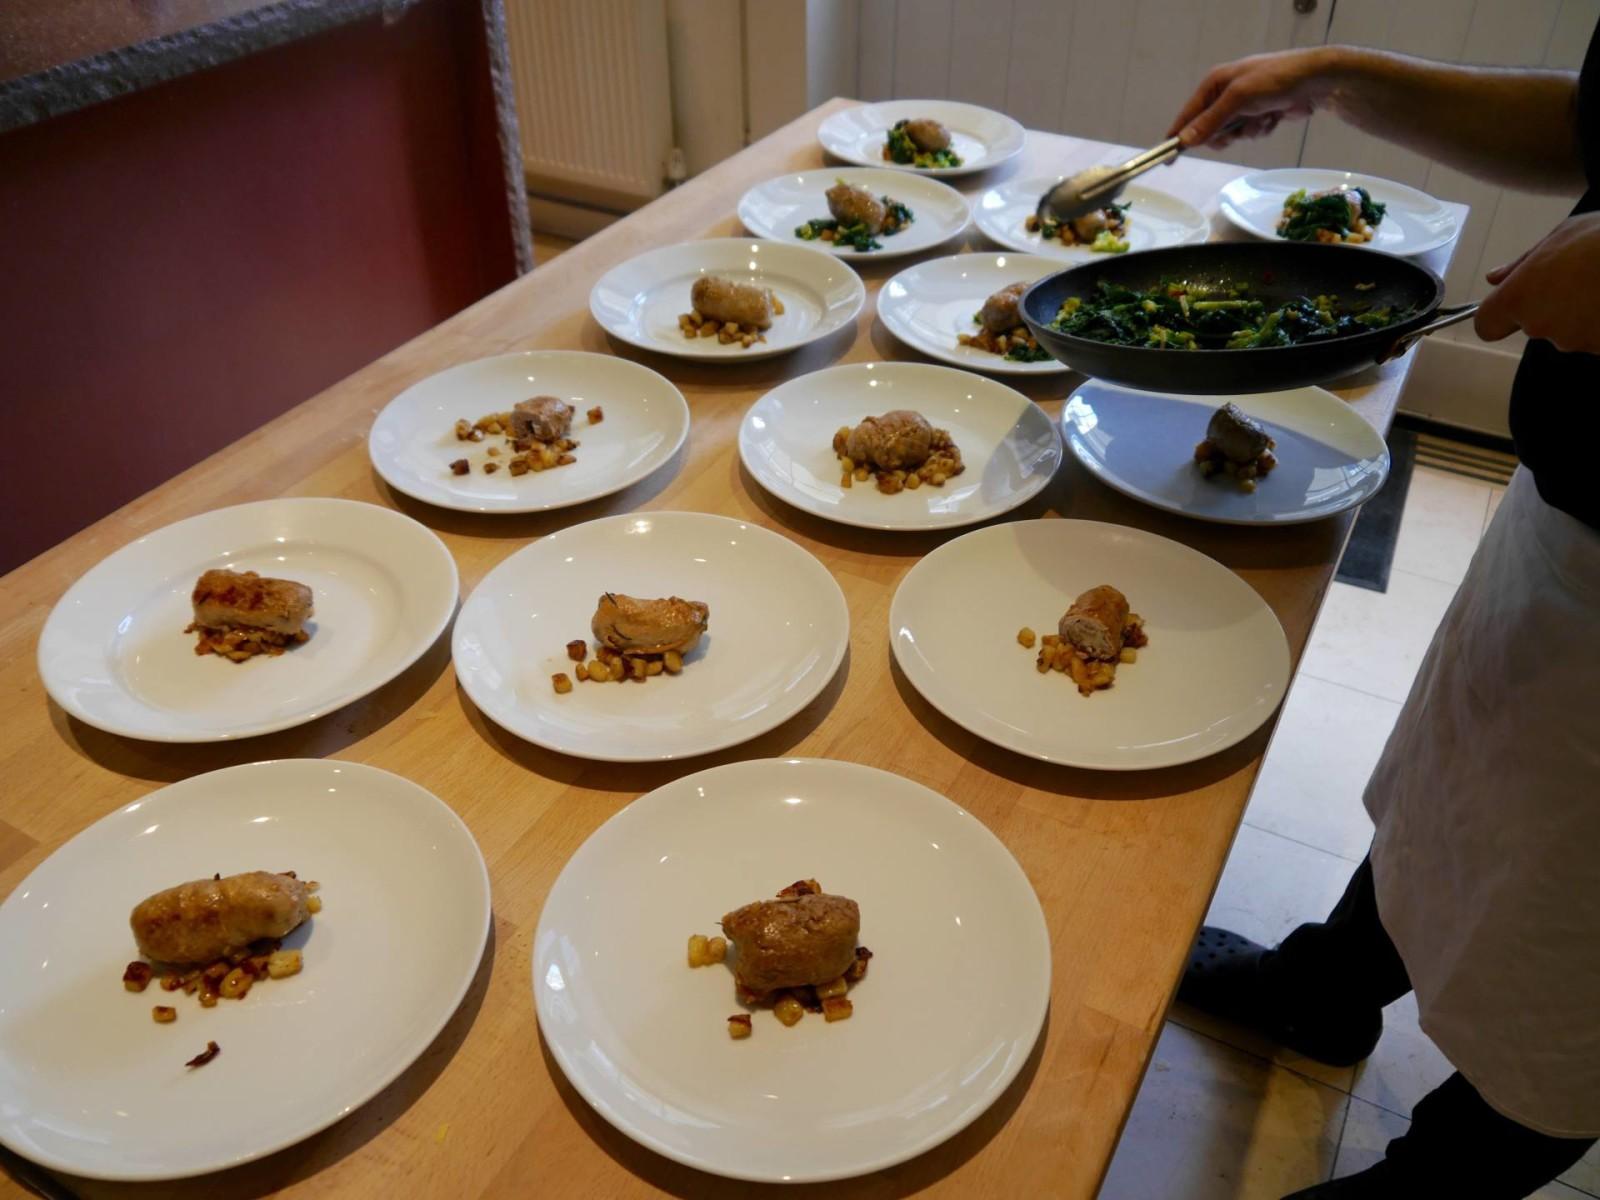 la-cucina-caldesi-cookery-school25